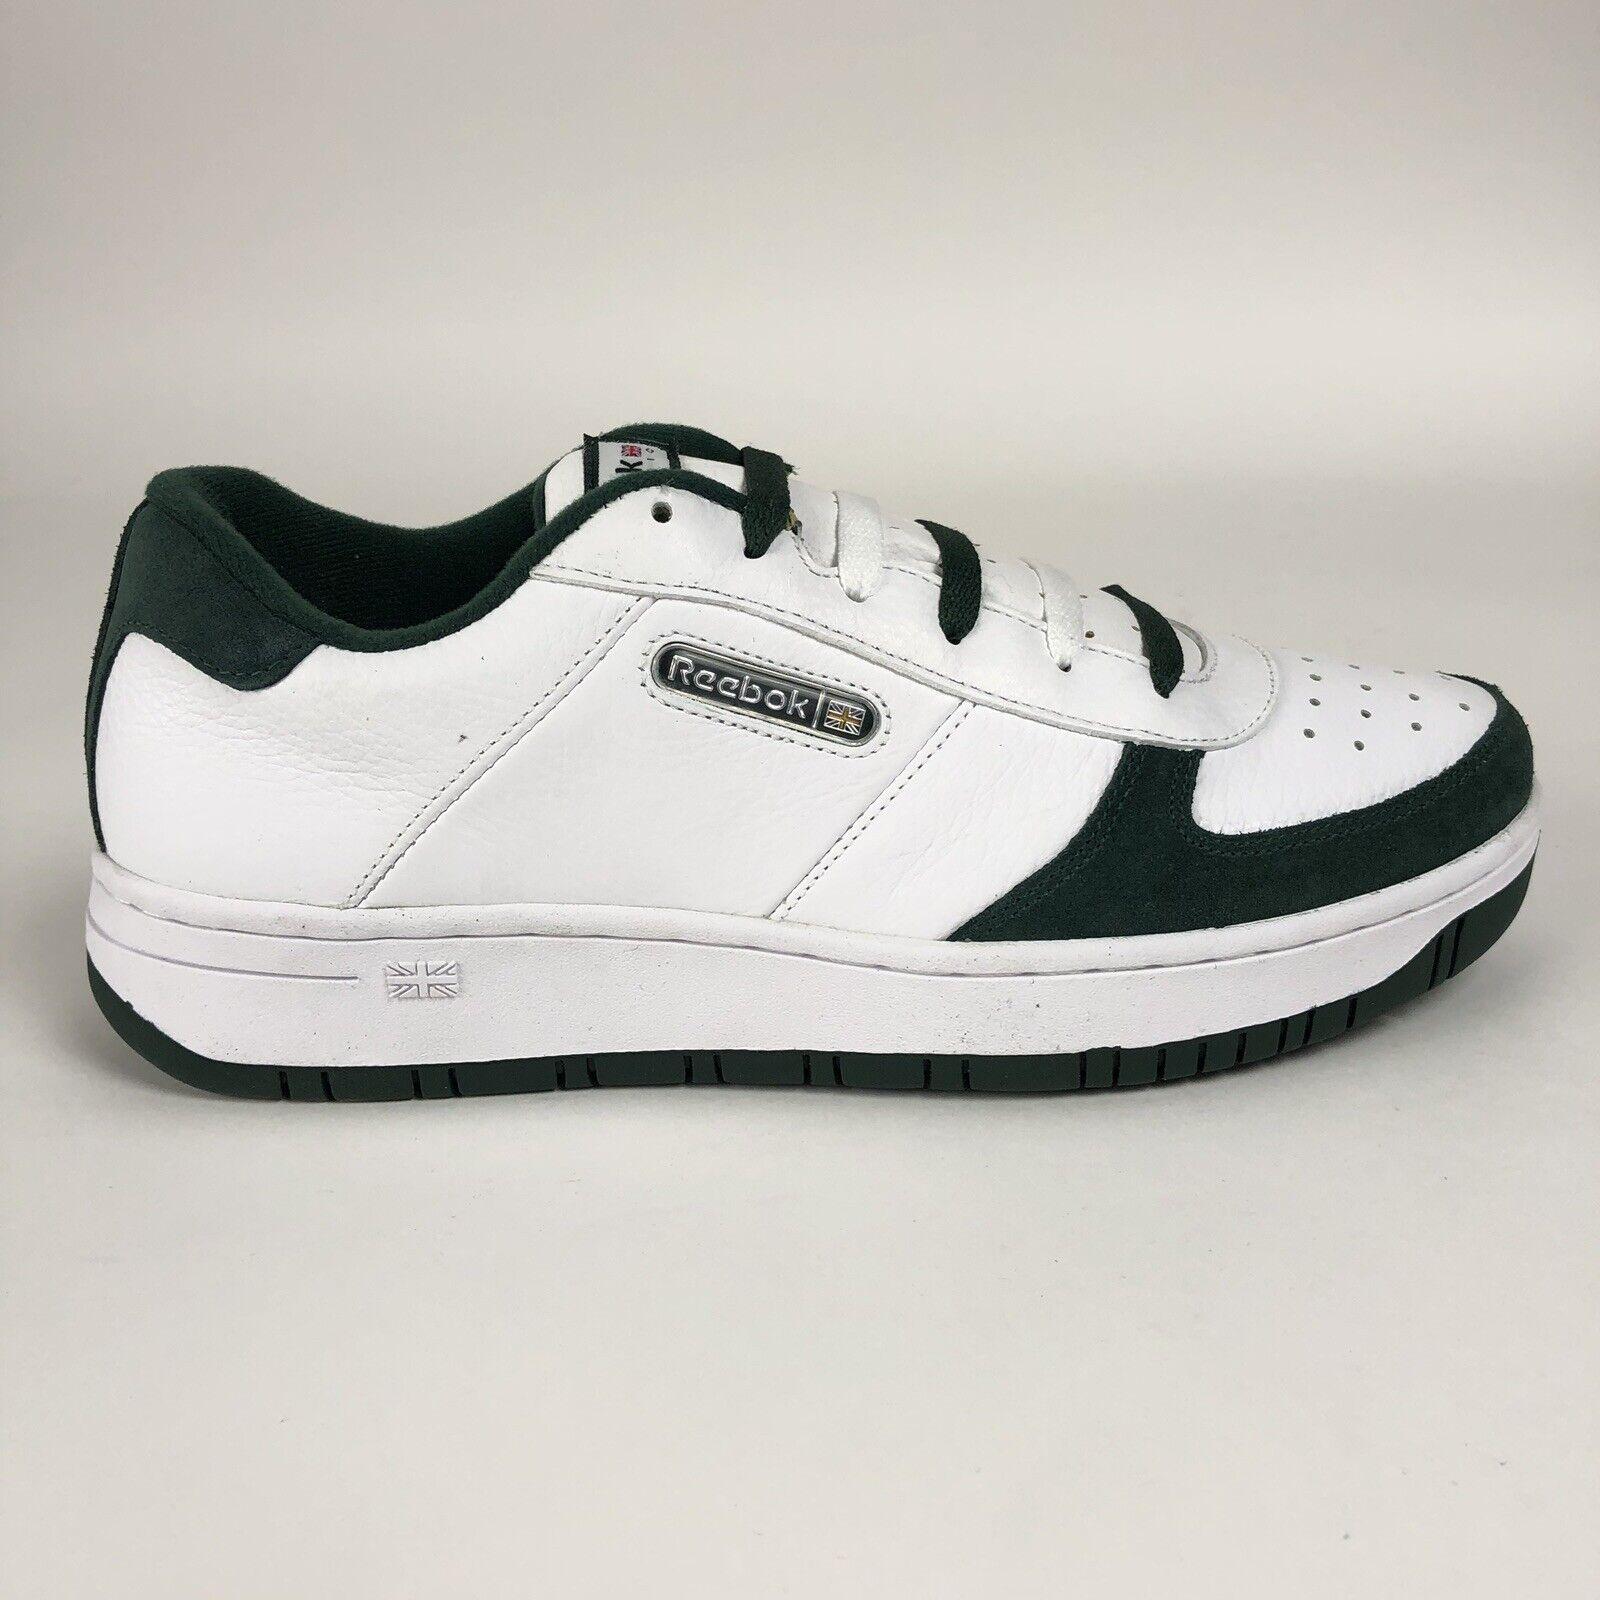 Reebok Classic Amaze bajo Edición Especial Zapatos para hombre 9.5 Bosque verde 4-93817